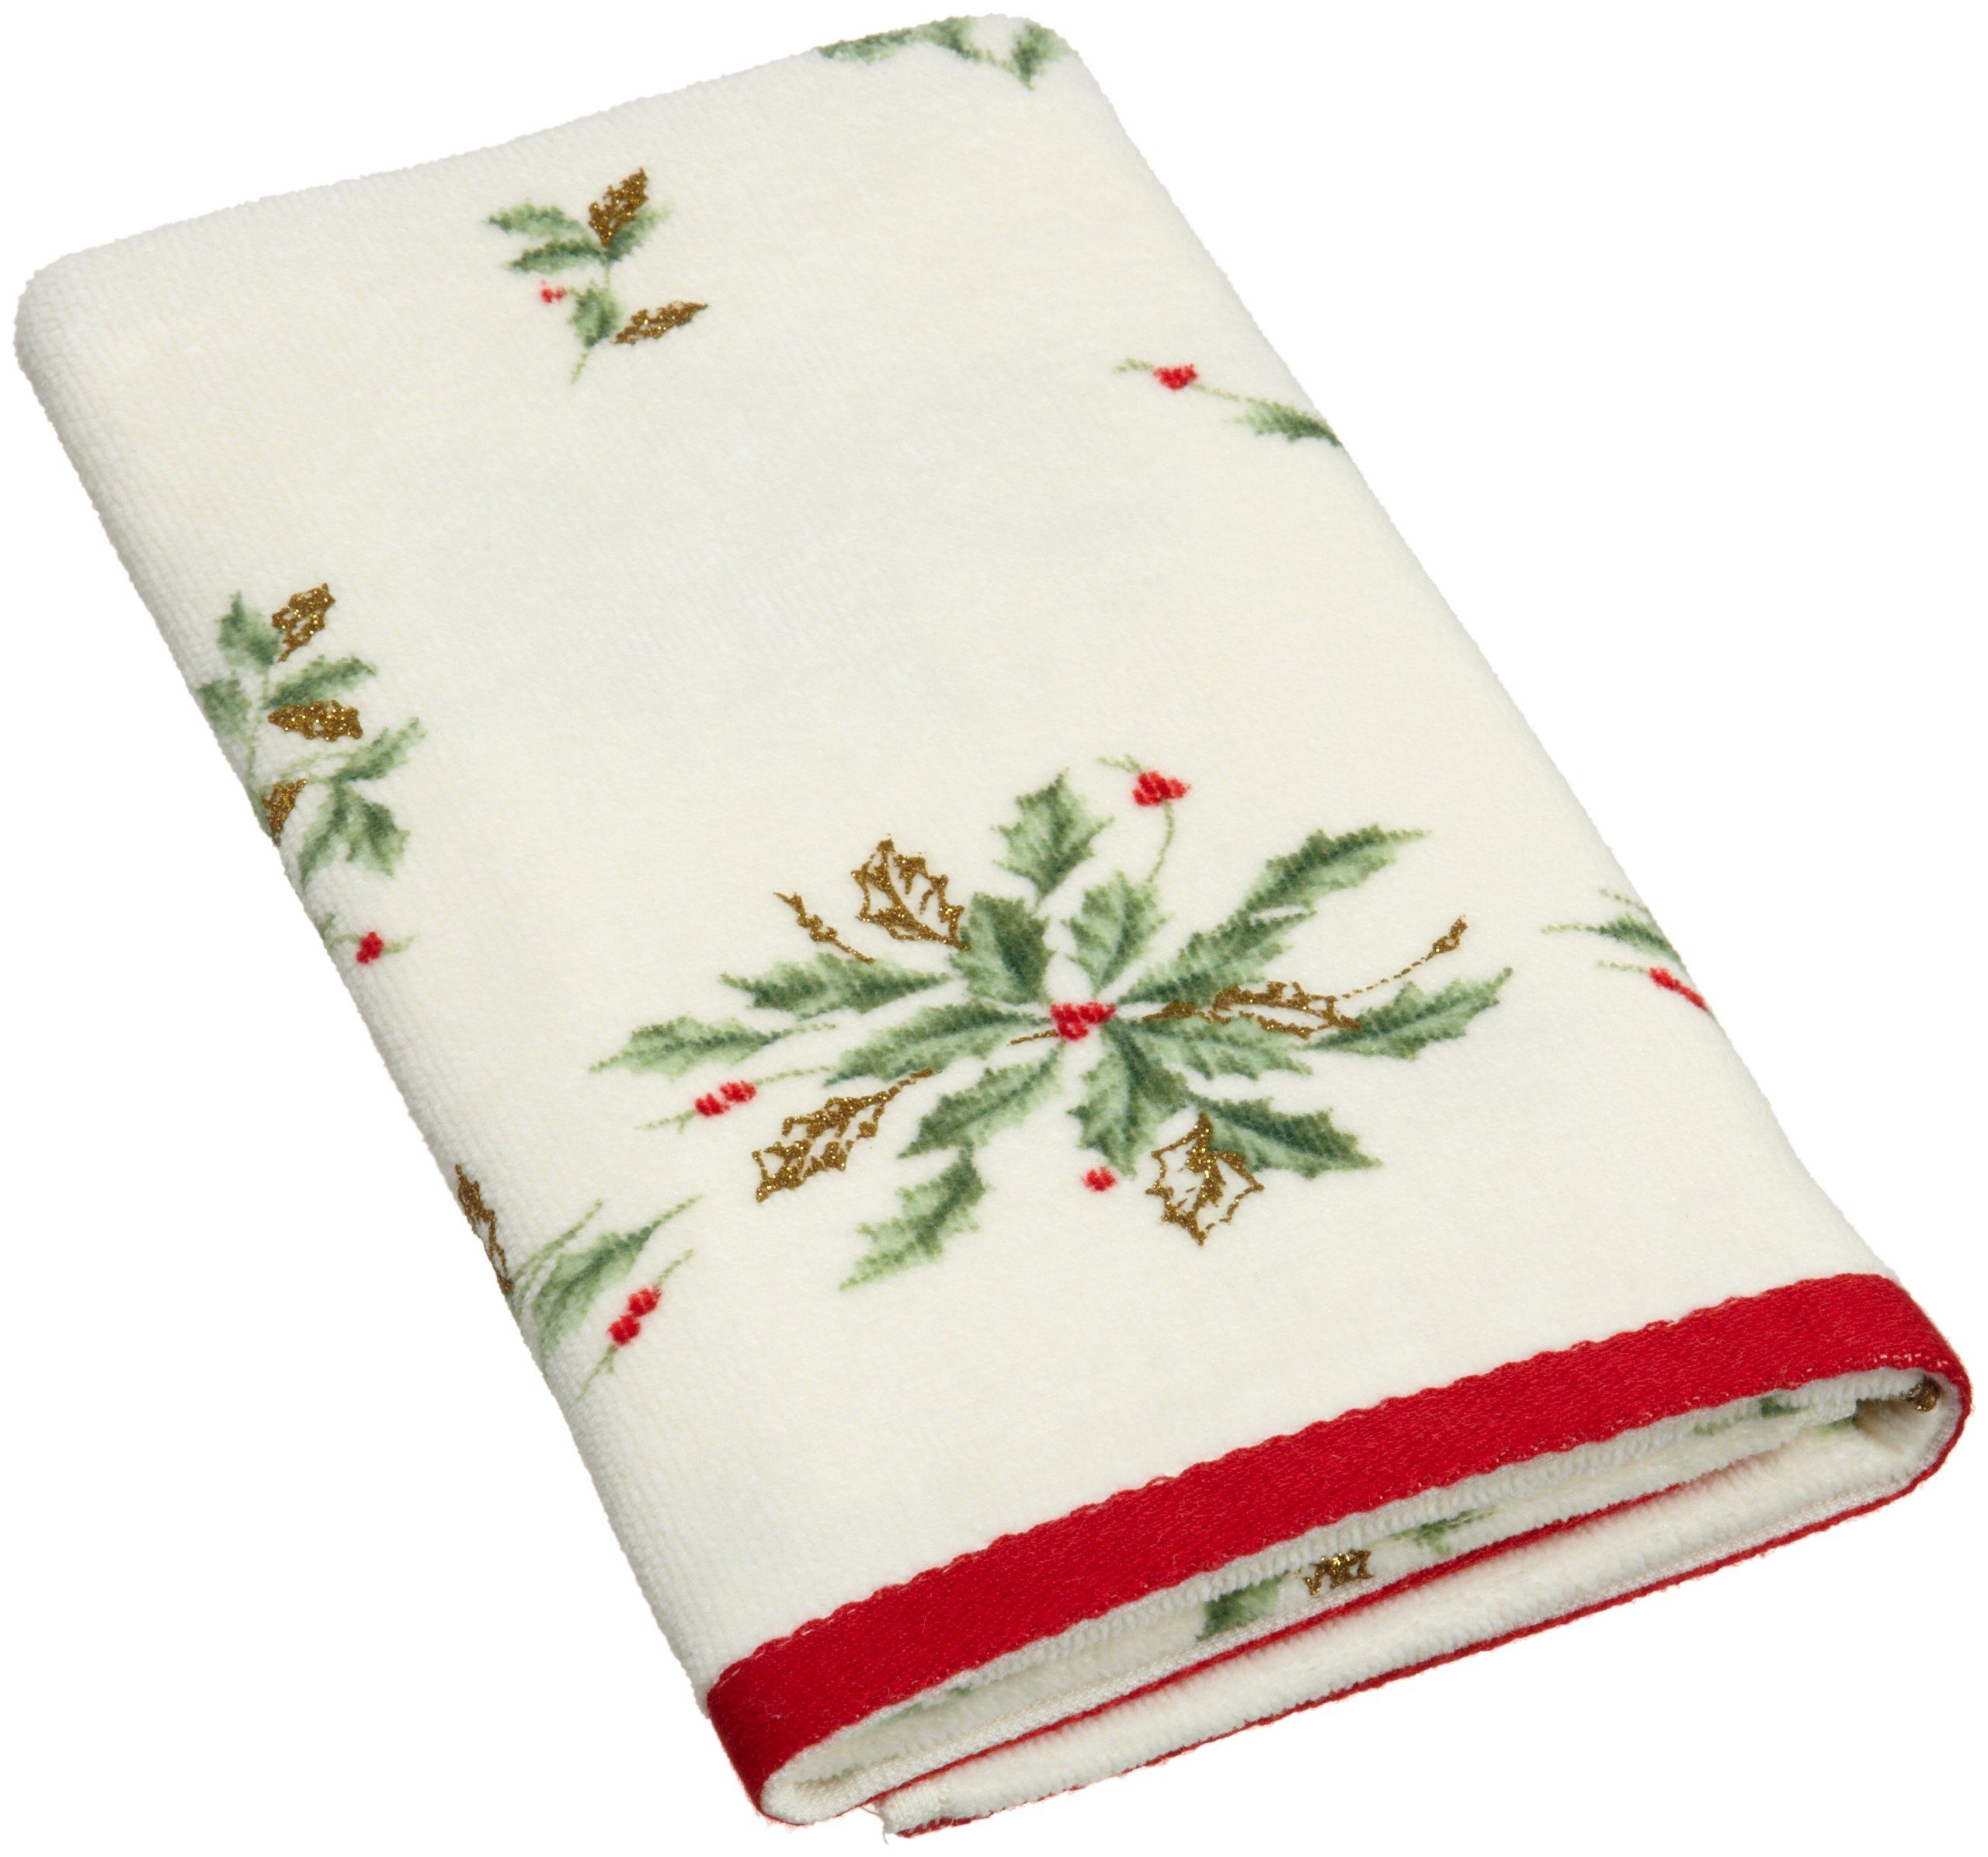 Lenox Holiday Printed Hand Towel